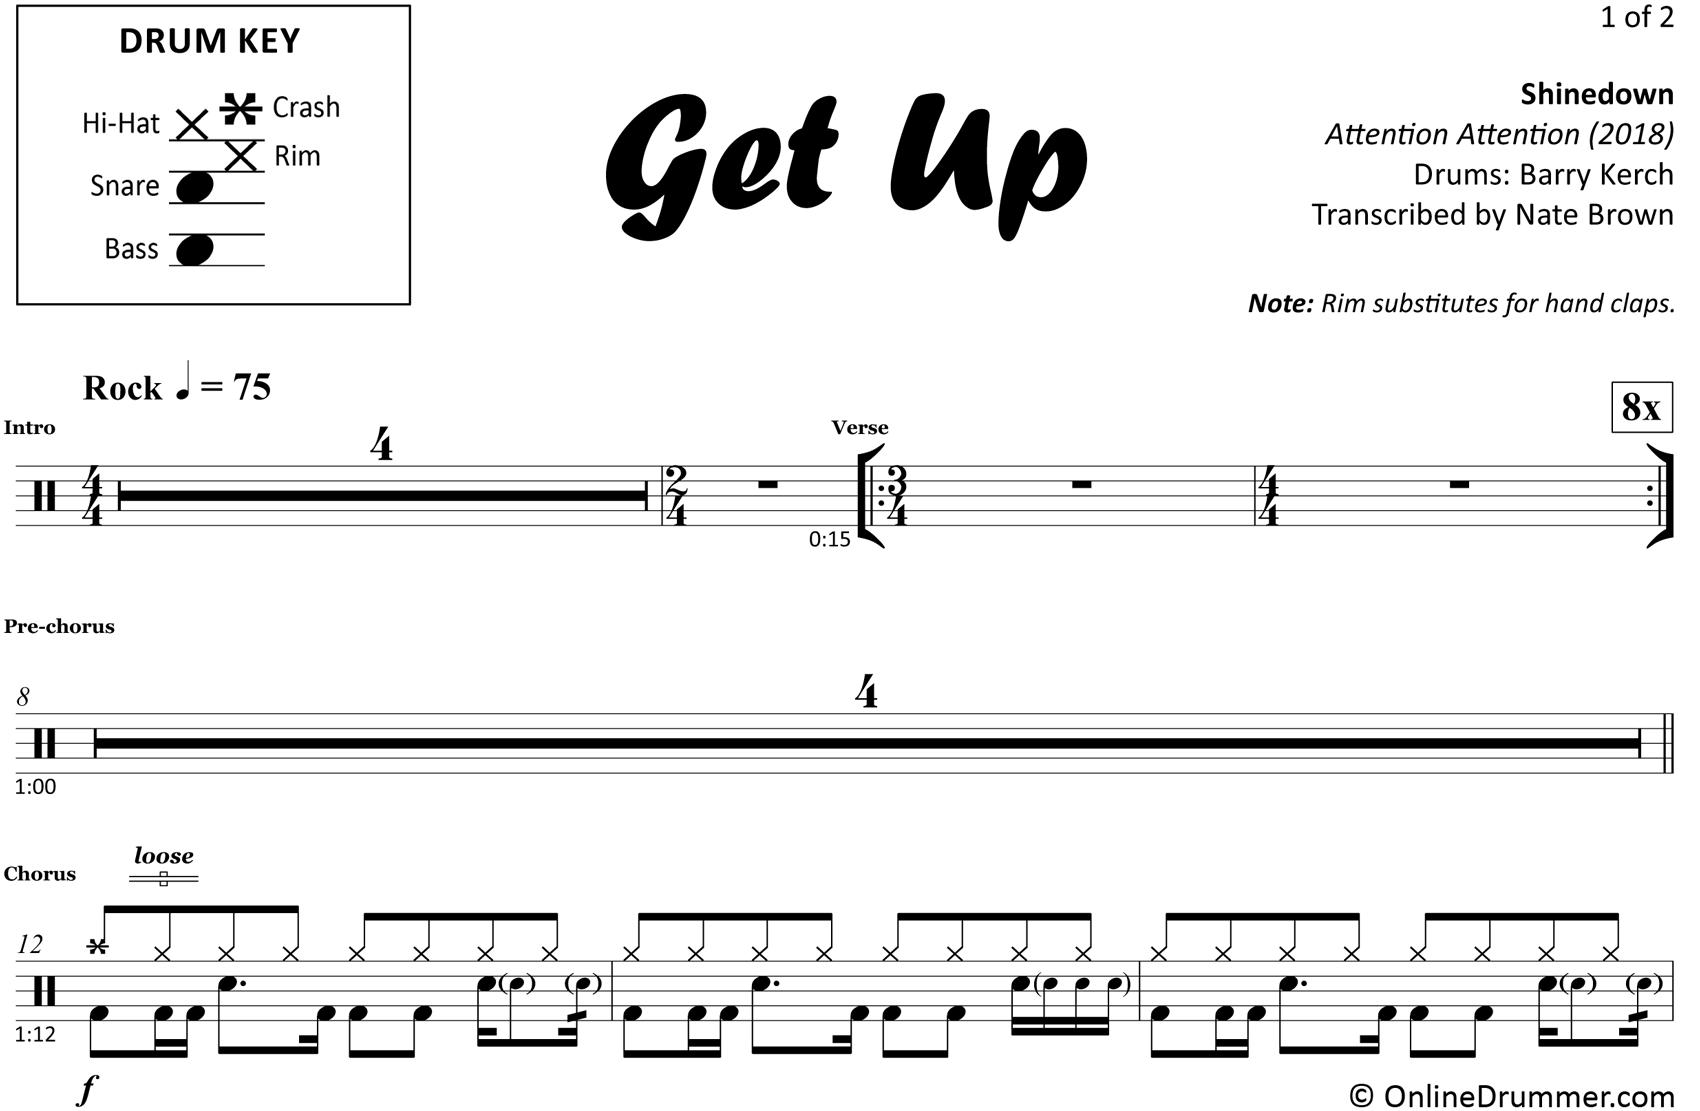 Get Up - Shinedown - Drum Sheet Music